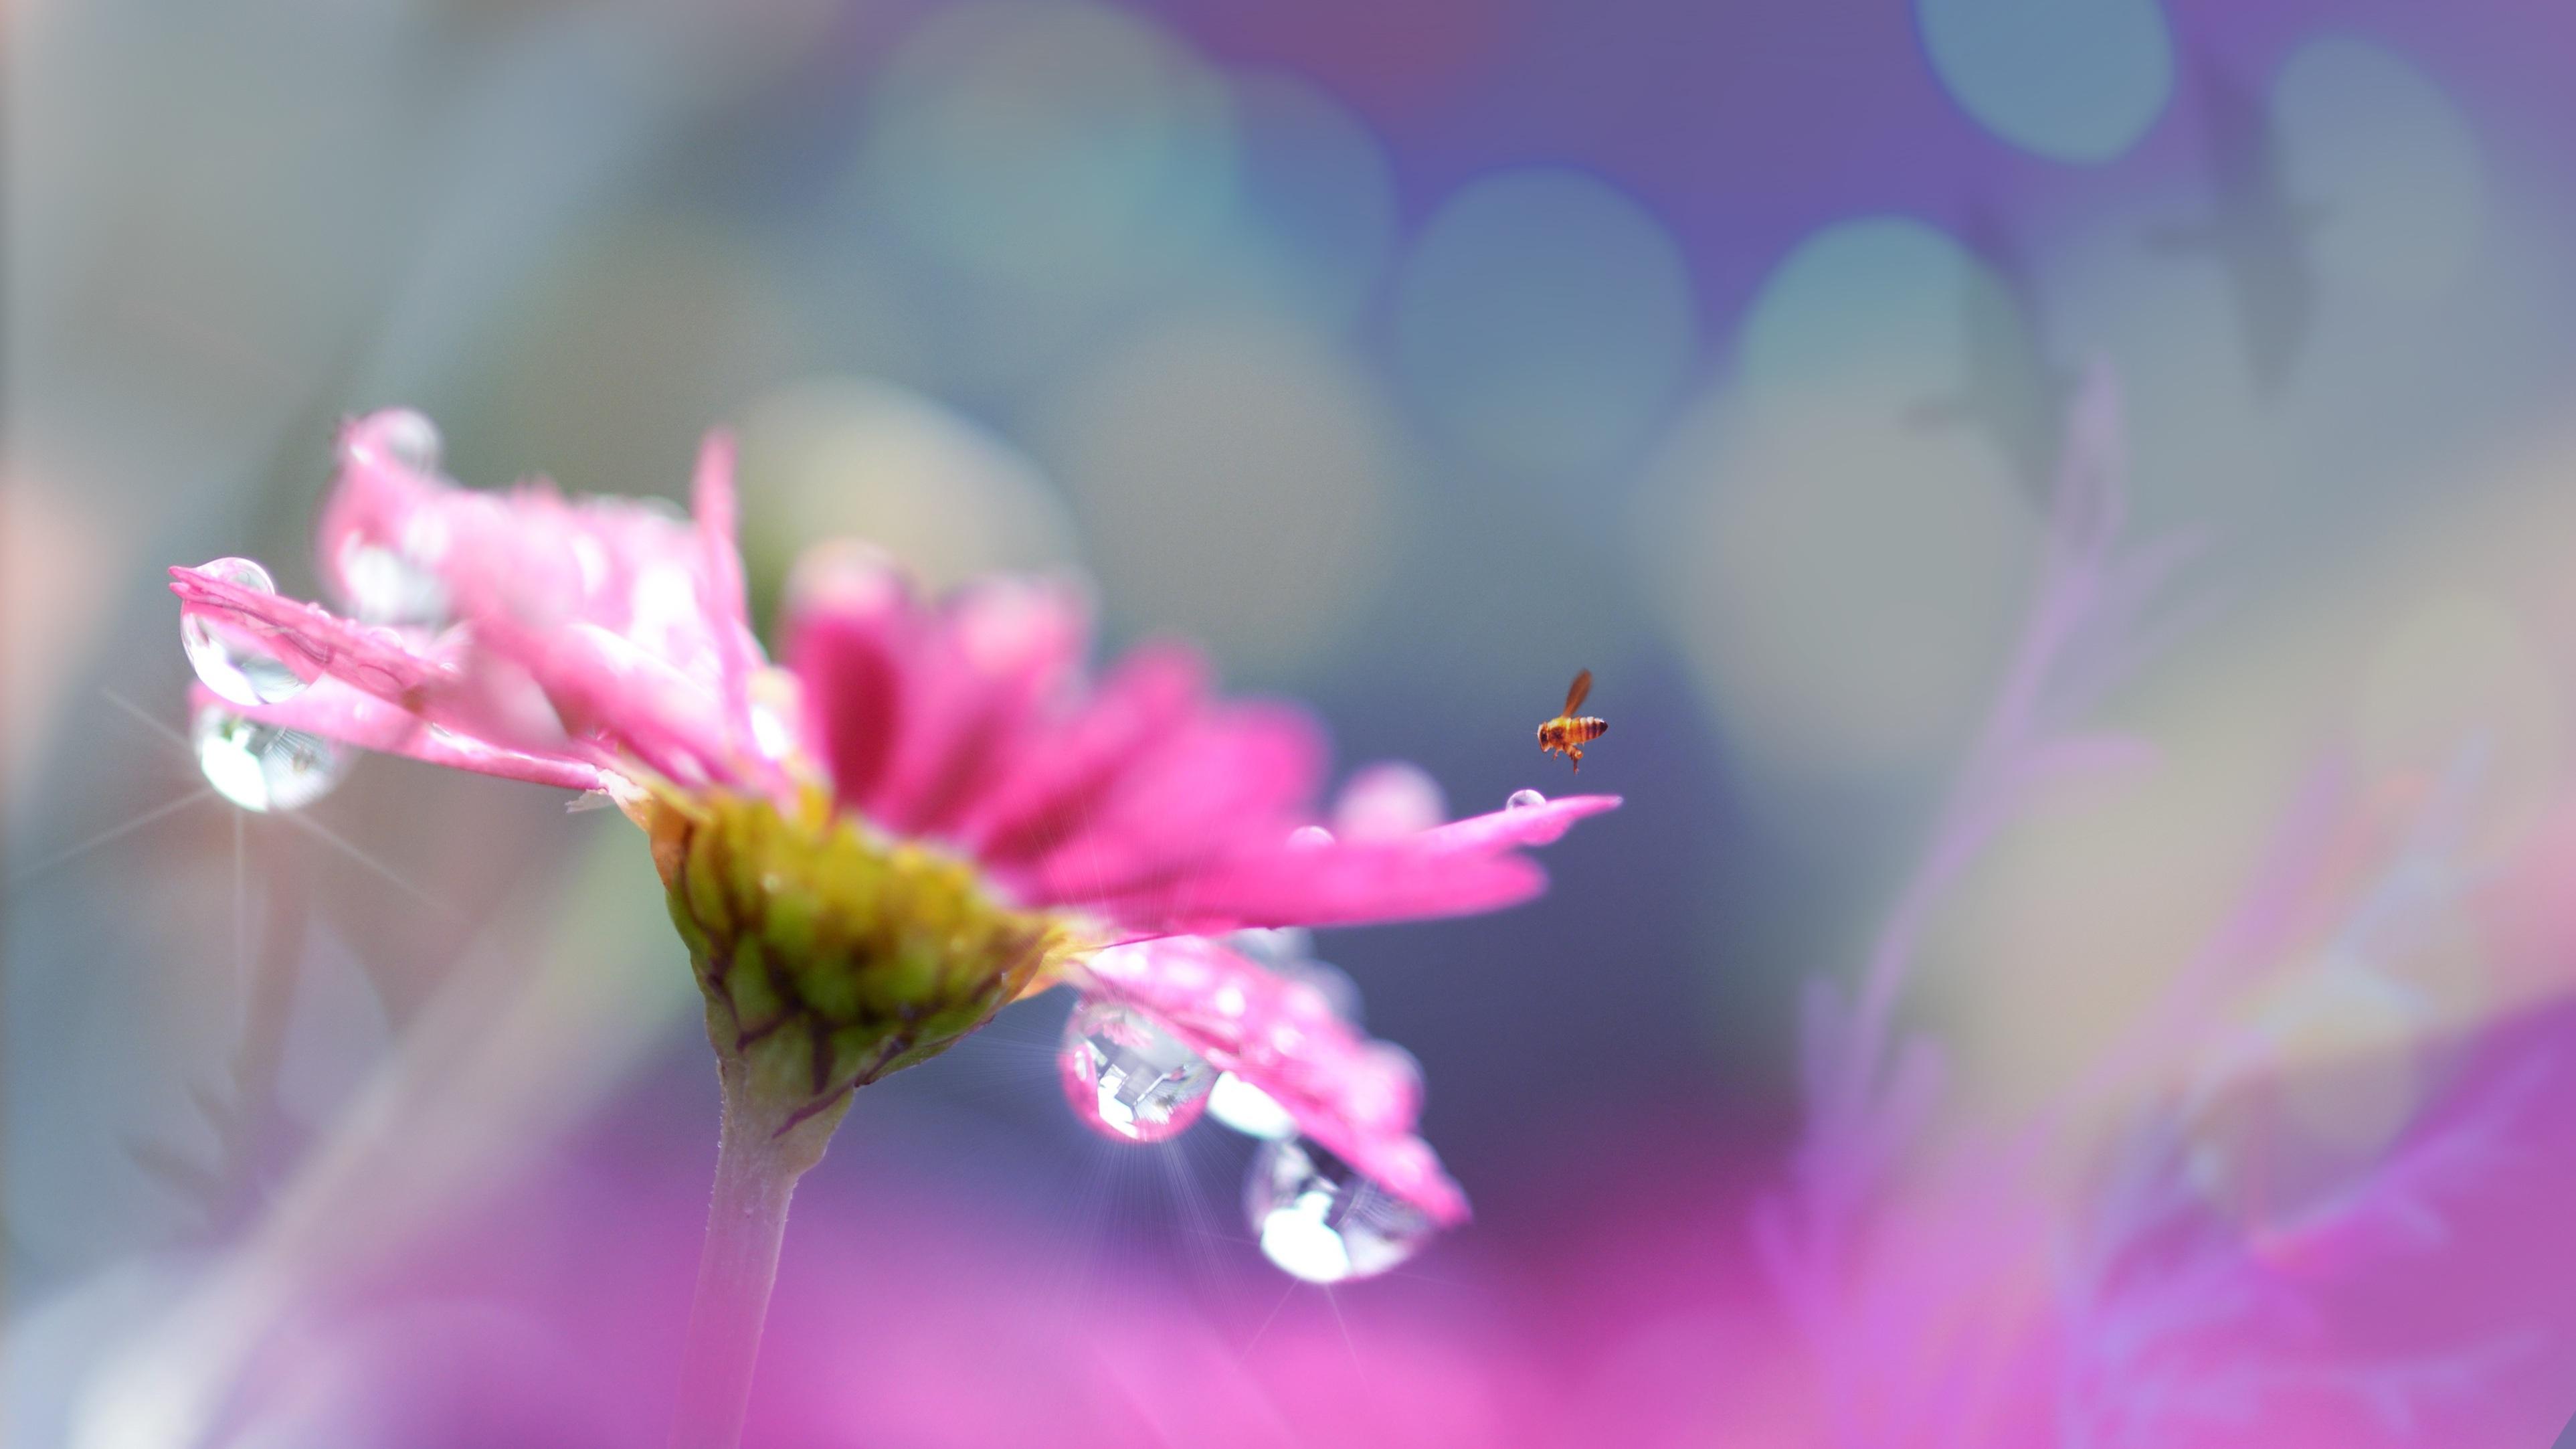 Free Images Landscape Nature Outdoor Blossom Droplet